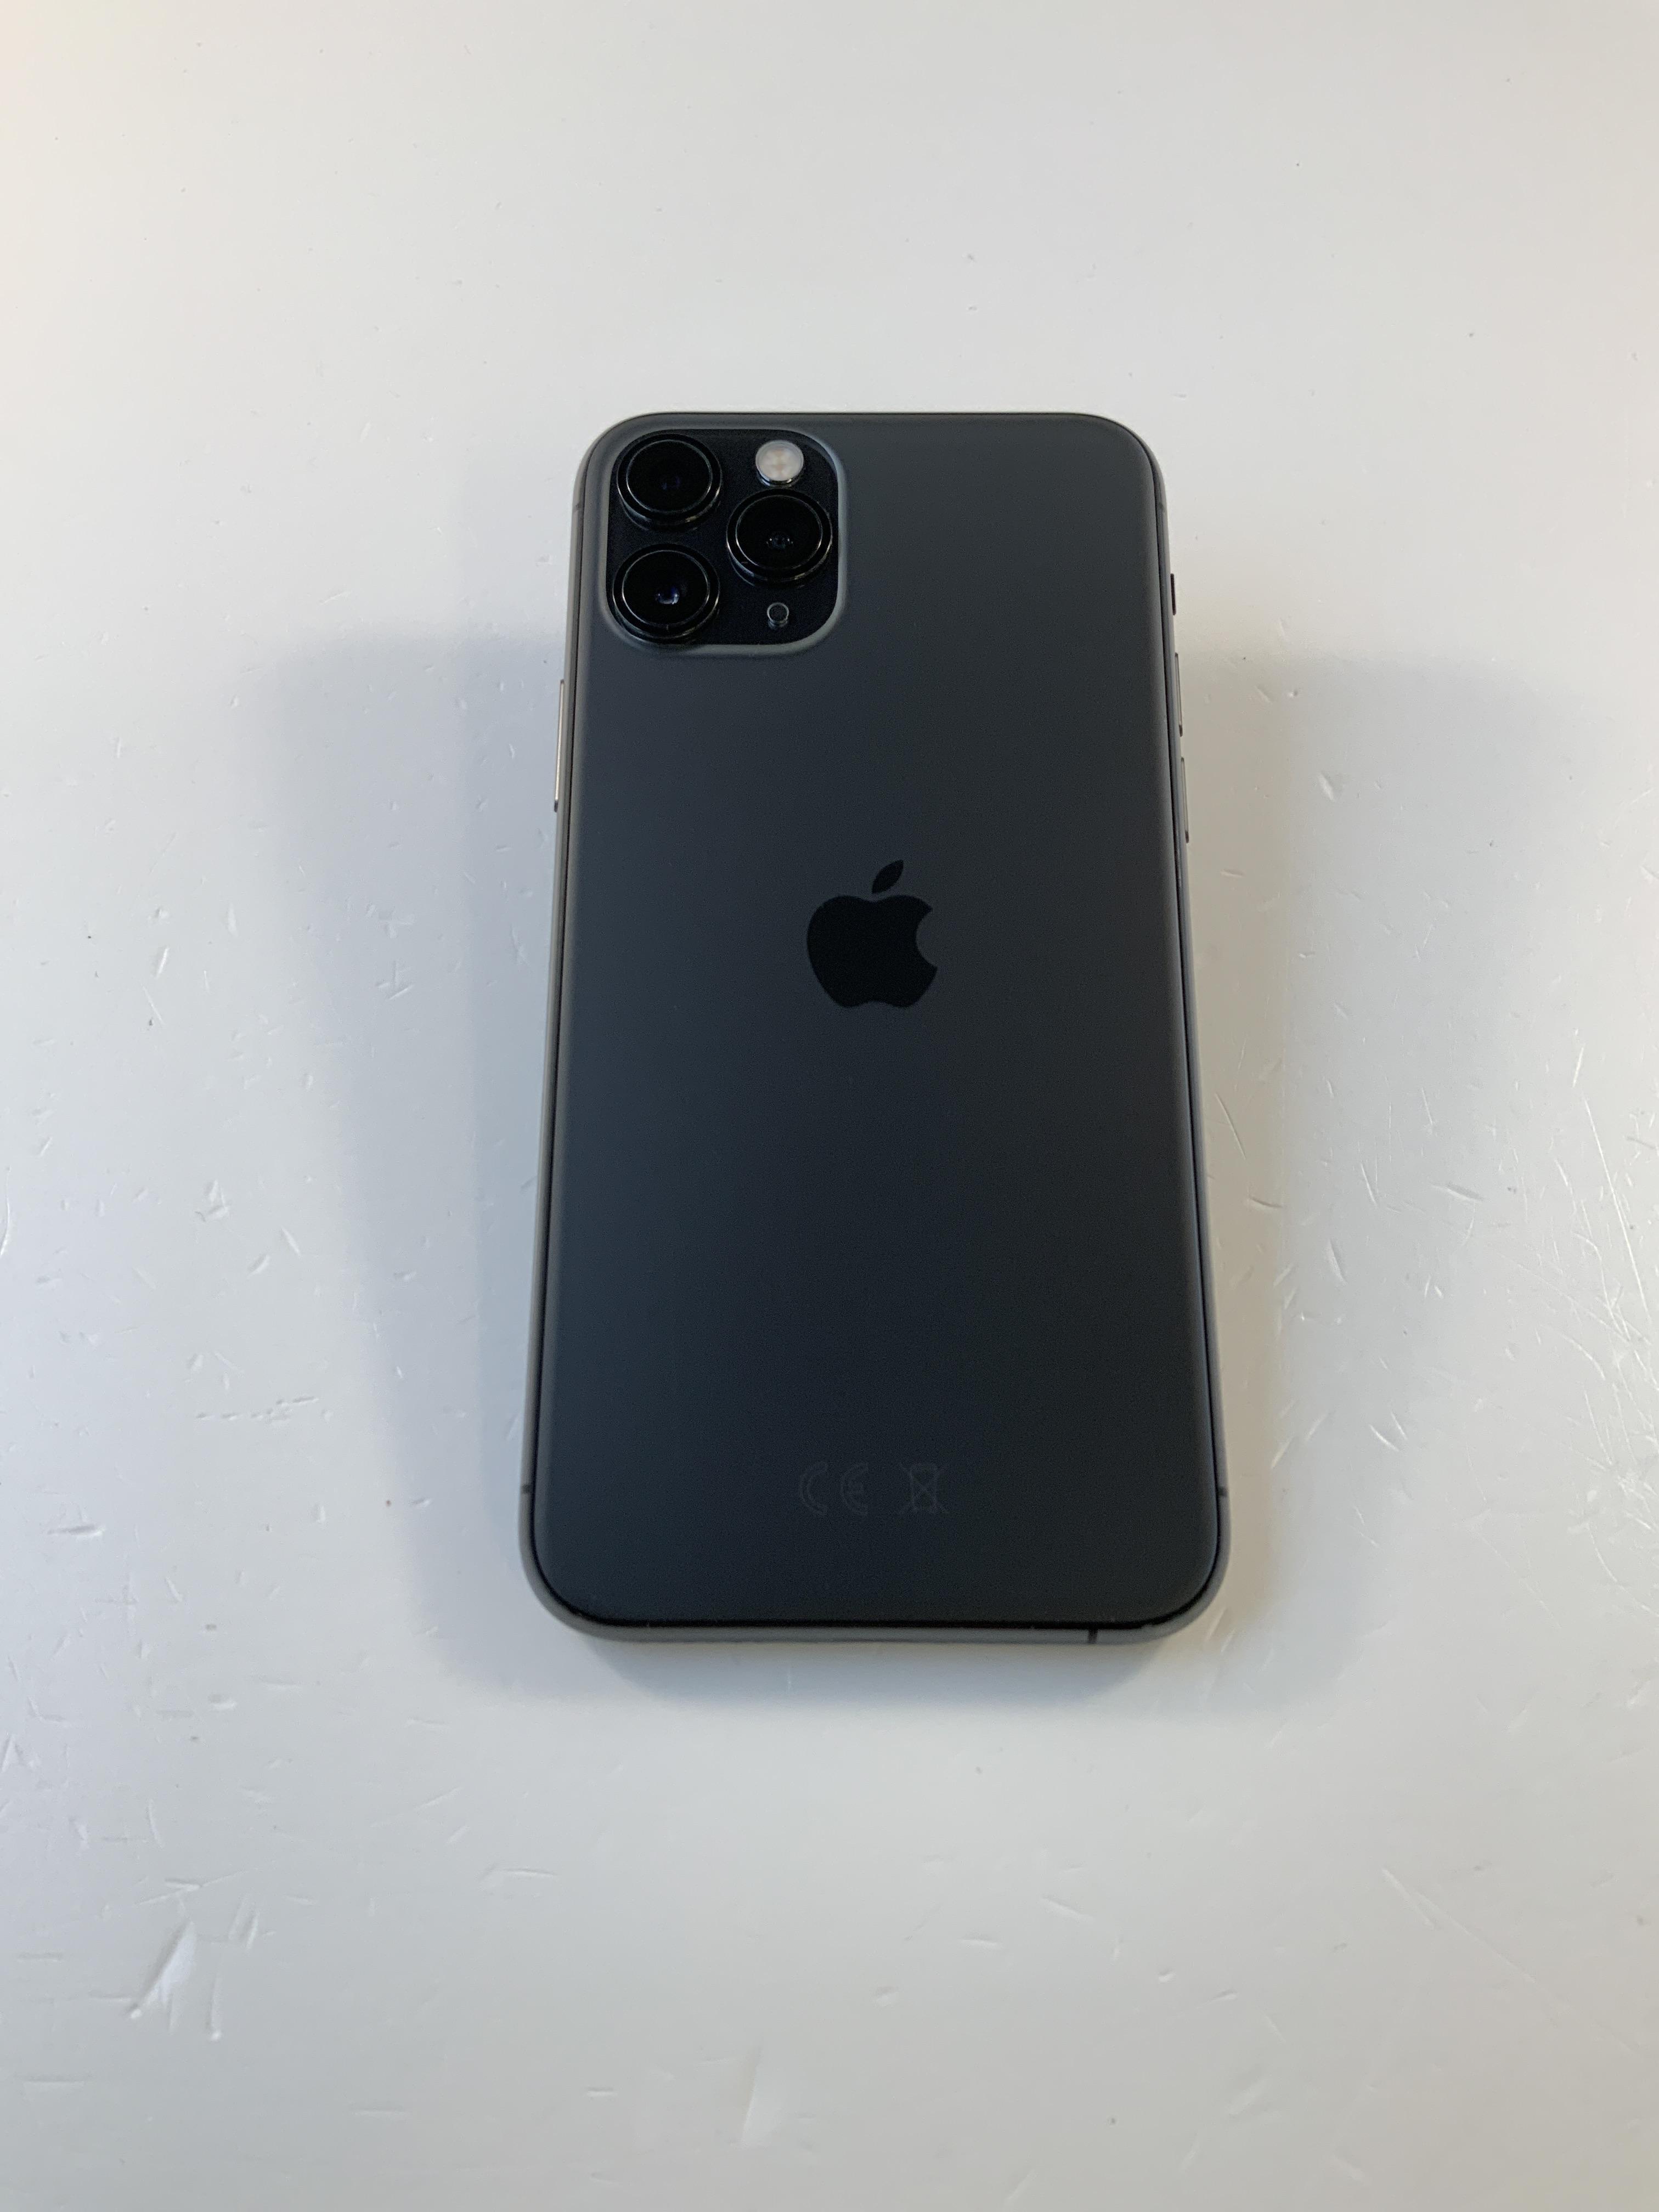 iPhone 11 Pro 64GB, 64GB, Space Gray, image 2